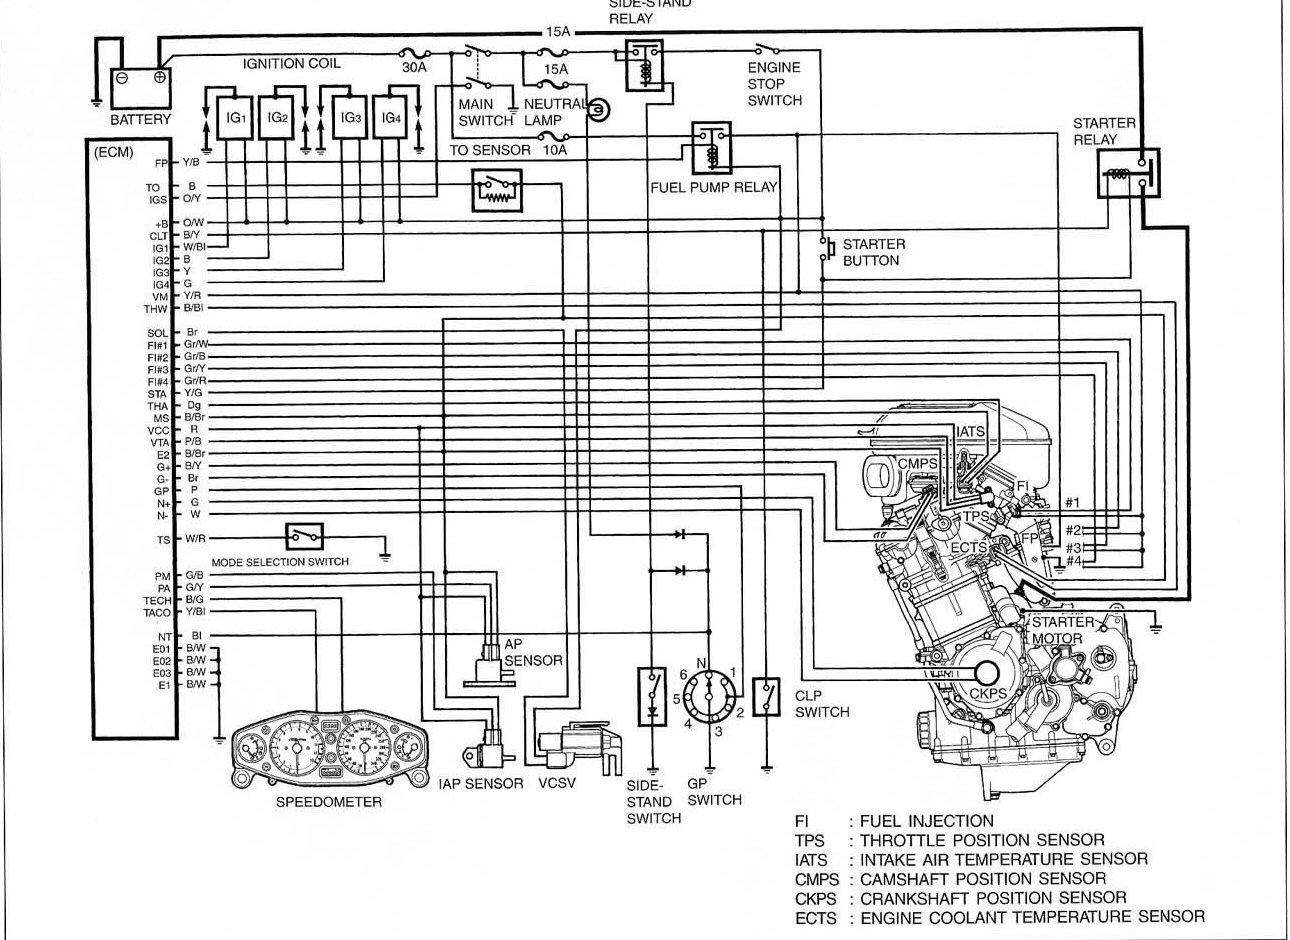 [DIAGRAM_3NM]  KC_3073] Wiring Harness Wiring Besides 2008 Suzuki Hayabusa Wiring Diagram  Schematic Wiring | 2007 Hayabusa Wiring Diagram |  | Eatte Rdona Oidei Hapolo Vesi Mohammedshrine Librar Wiring 101